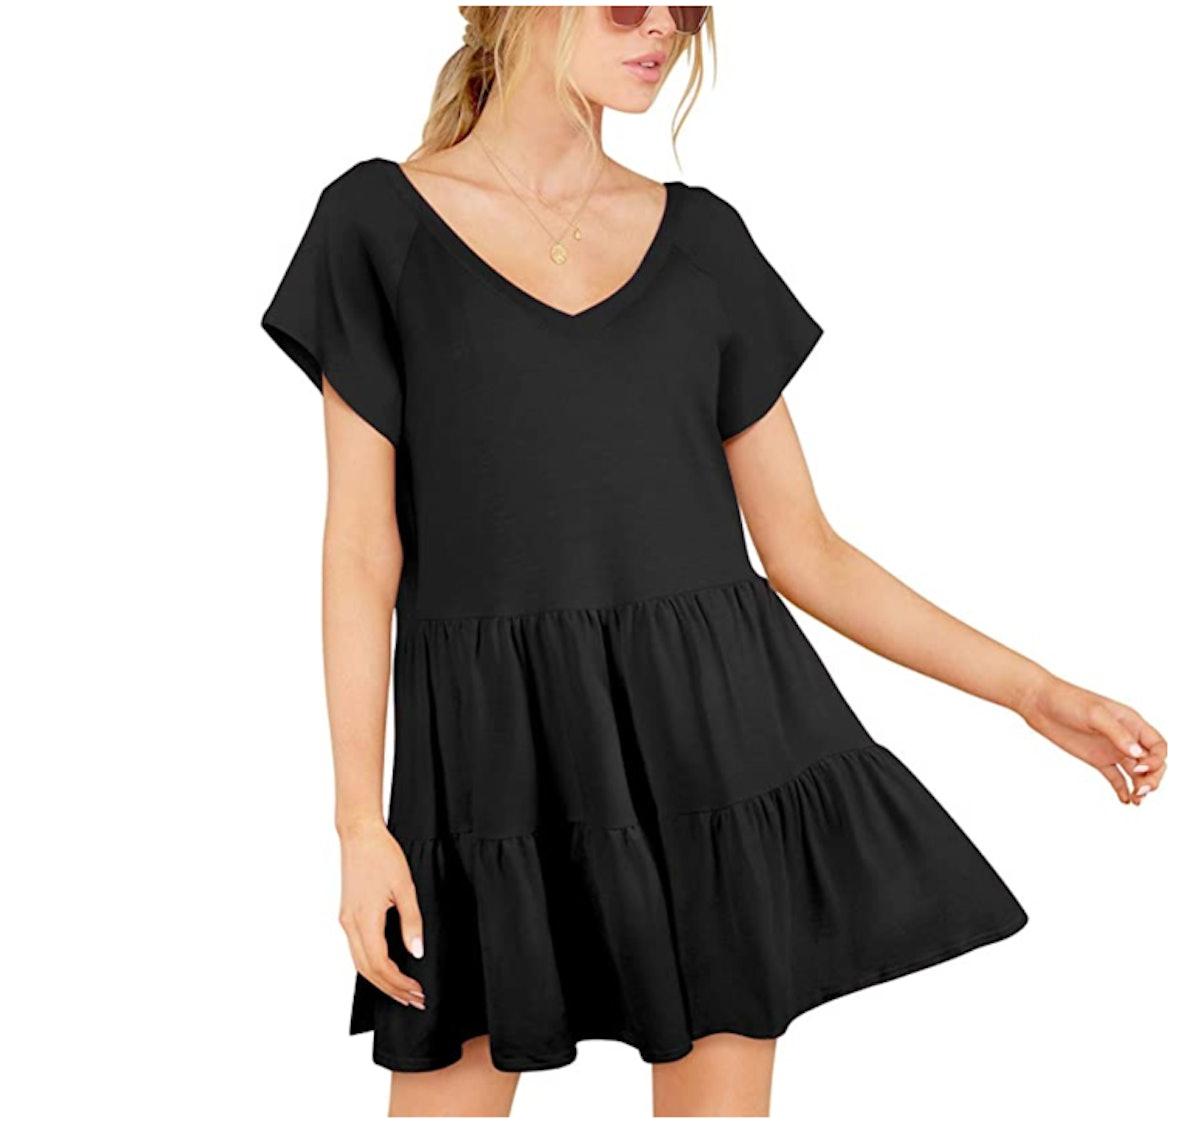 BELONGSCI Flowy V-Neck Mini Dress